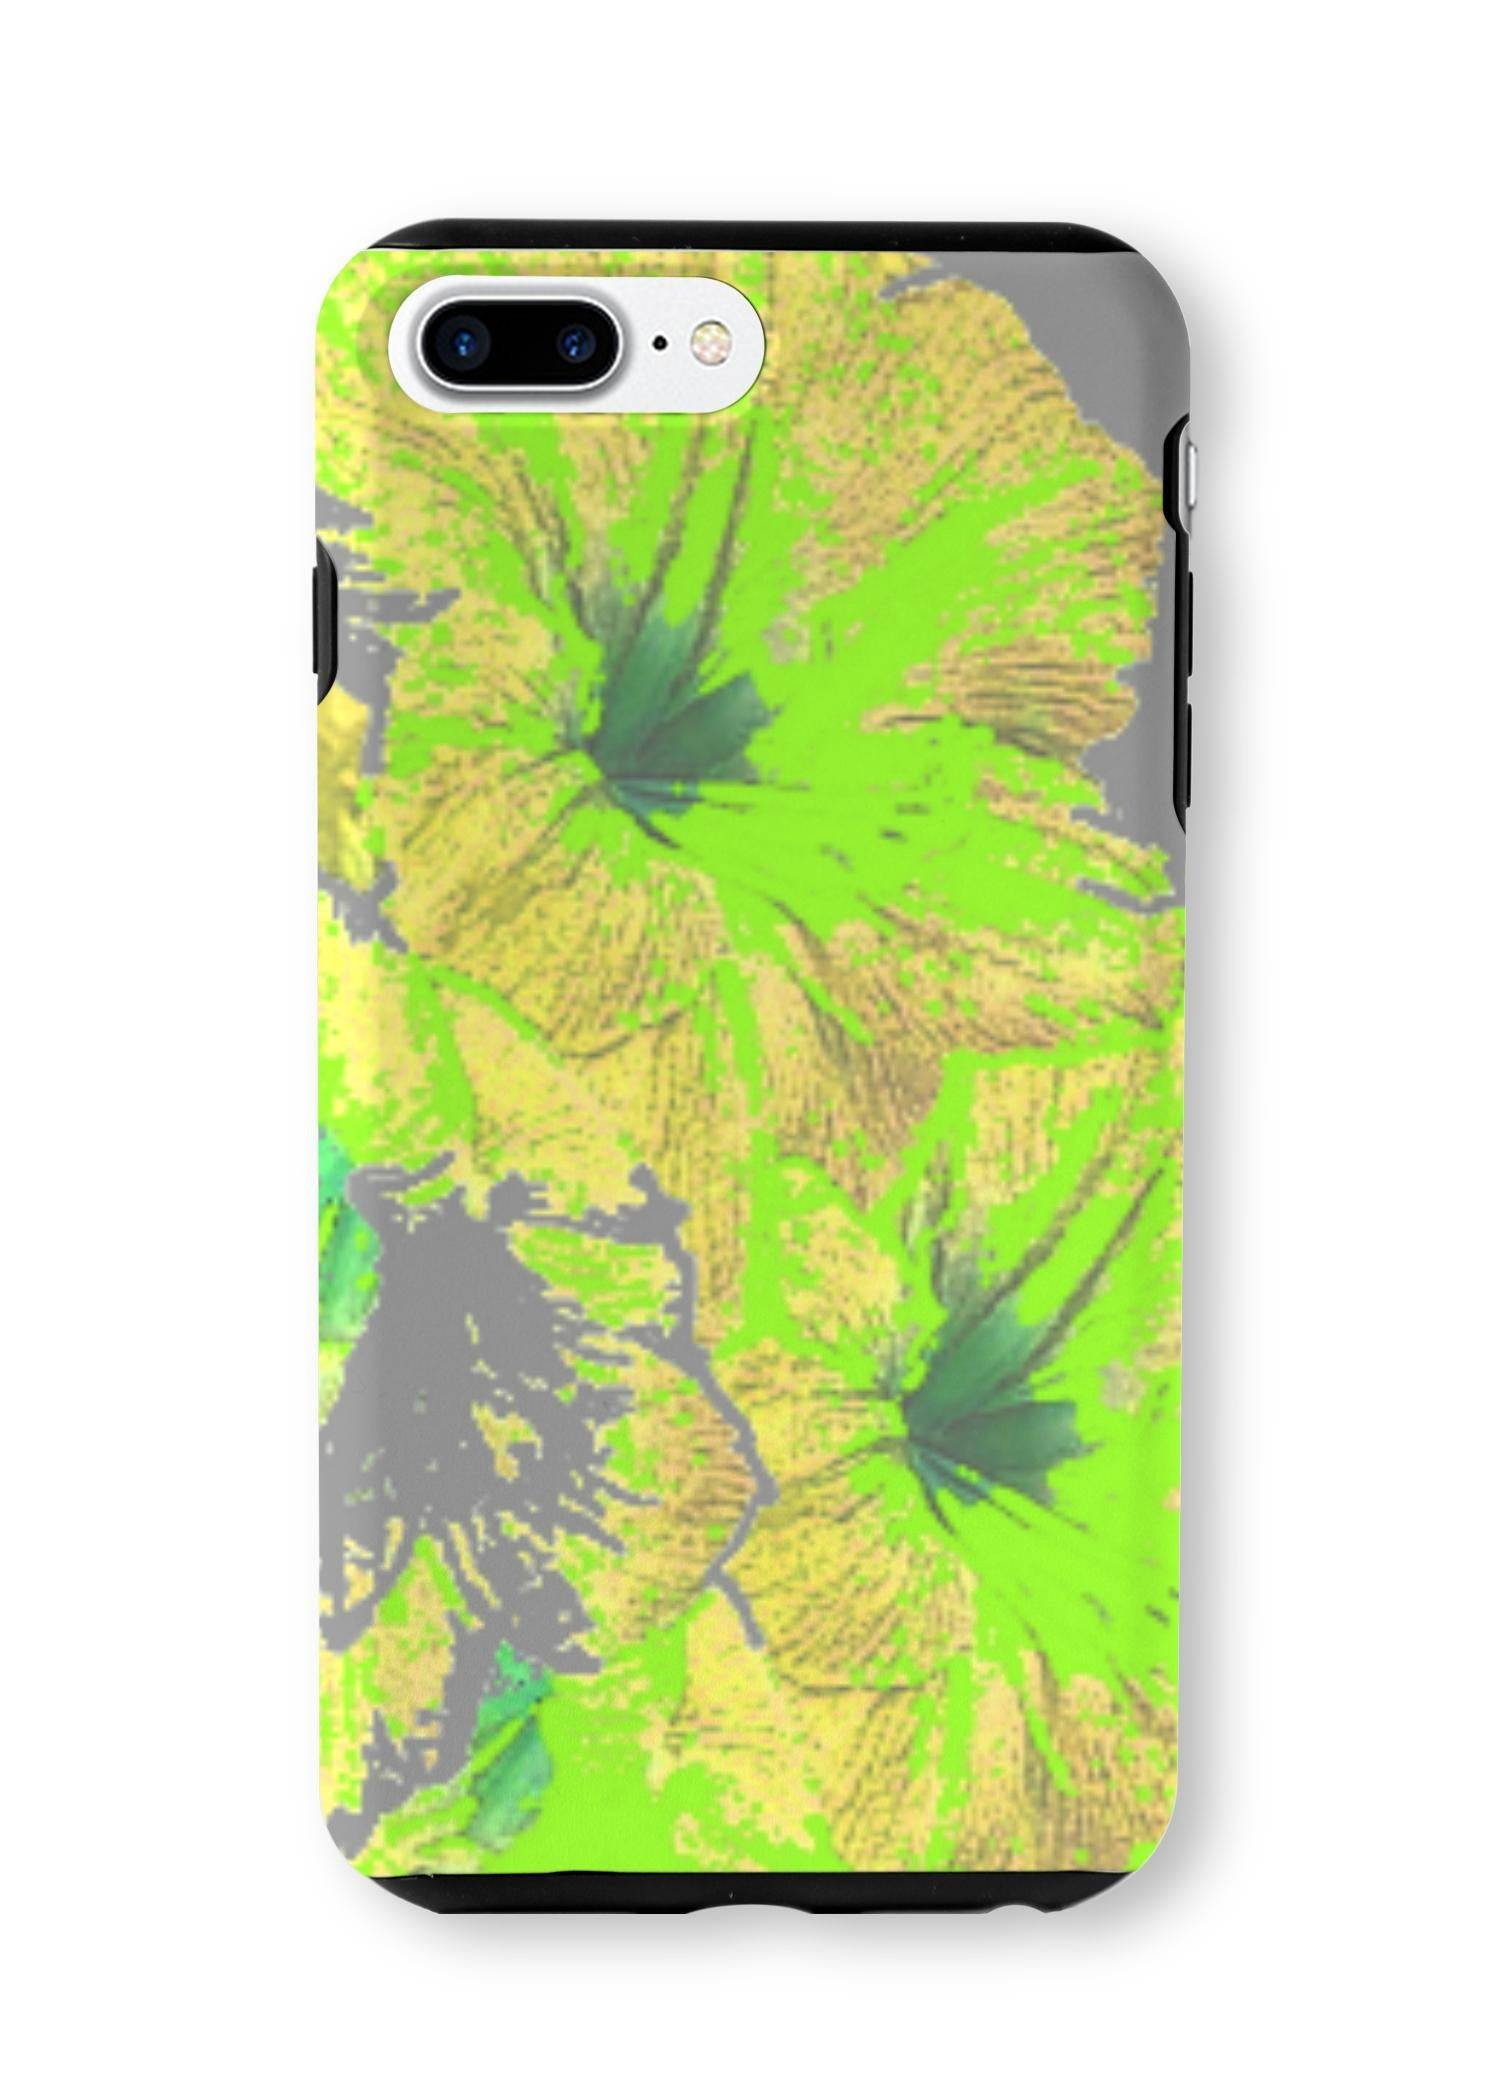 VIDA iPhone Case - Yellow Floral Garden Art by VIDA Original Artist  - Size: iPhone 7/8 PLUS / Tough